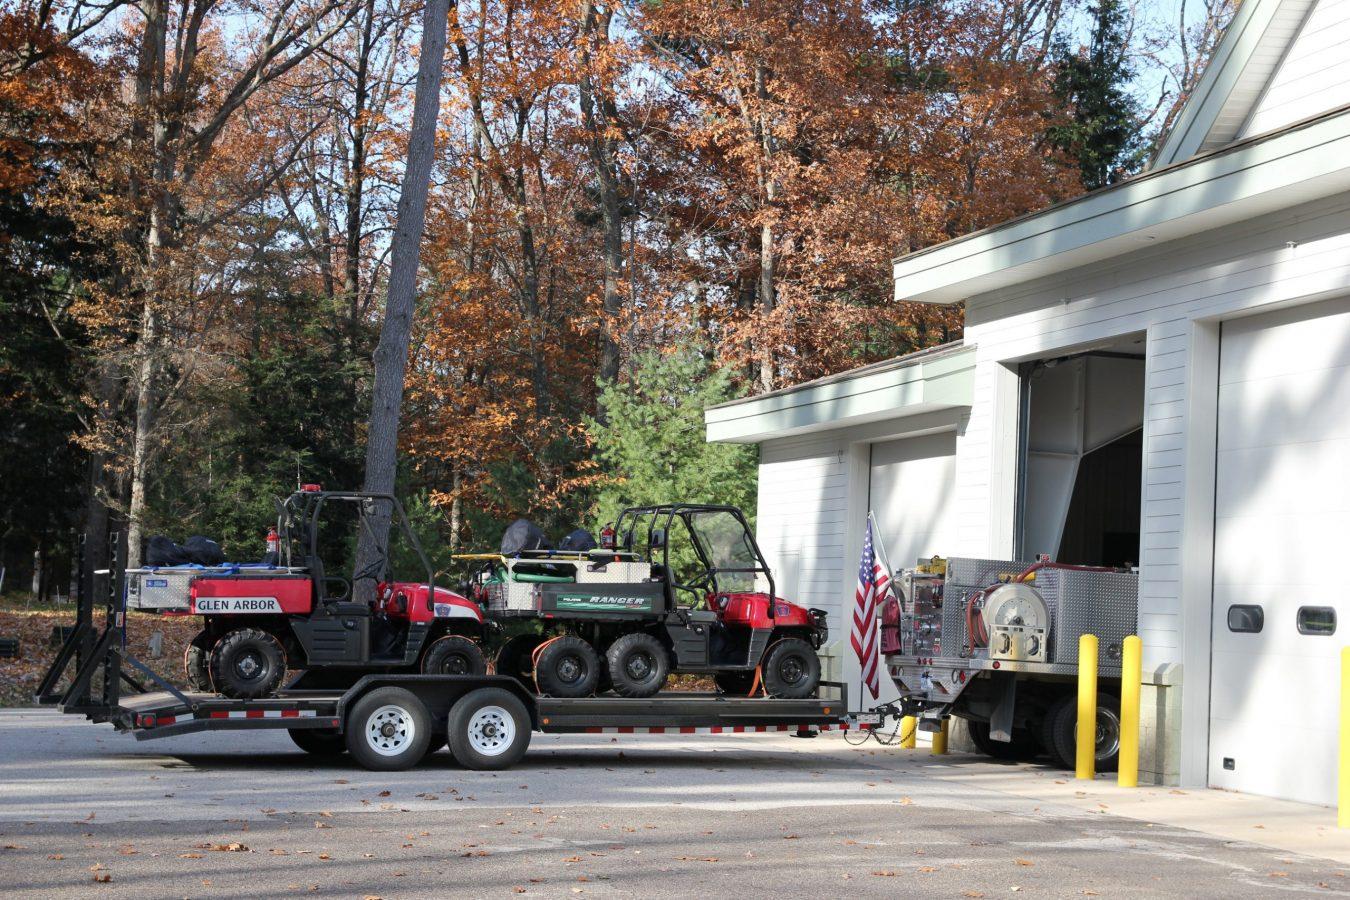 glfd truck pulling trailer of atv's